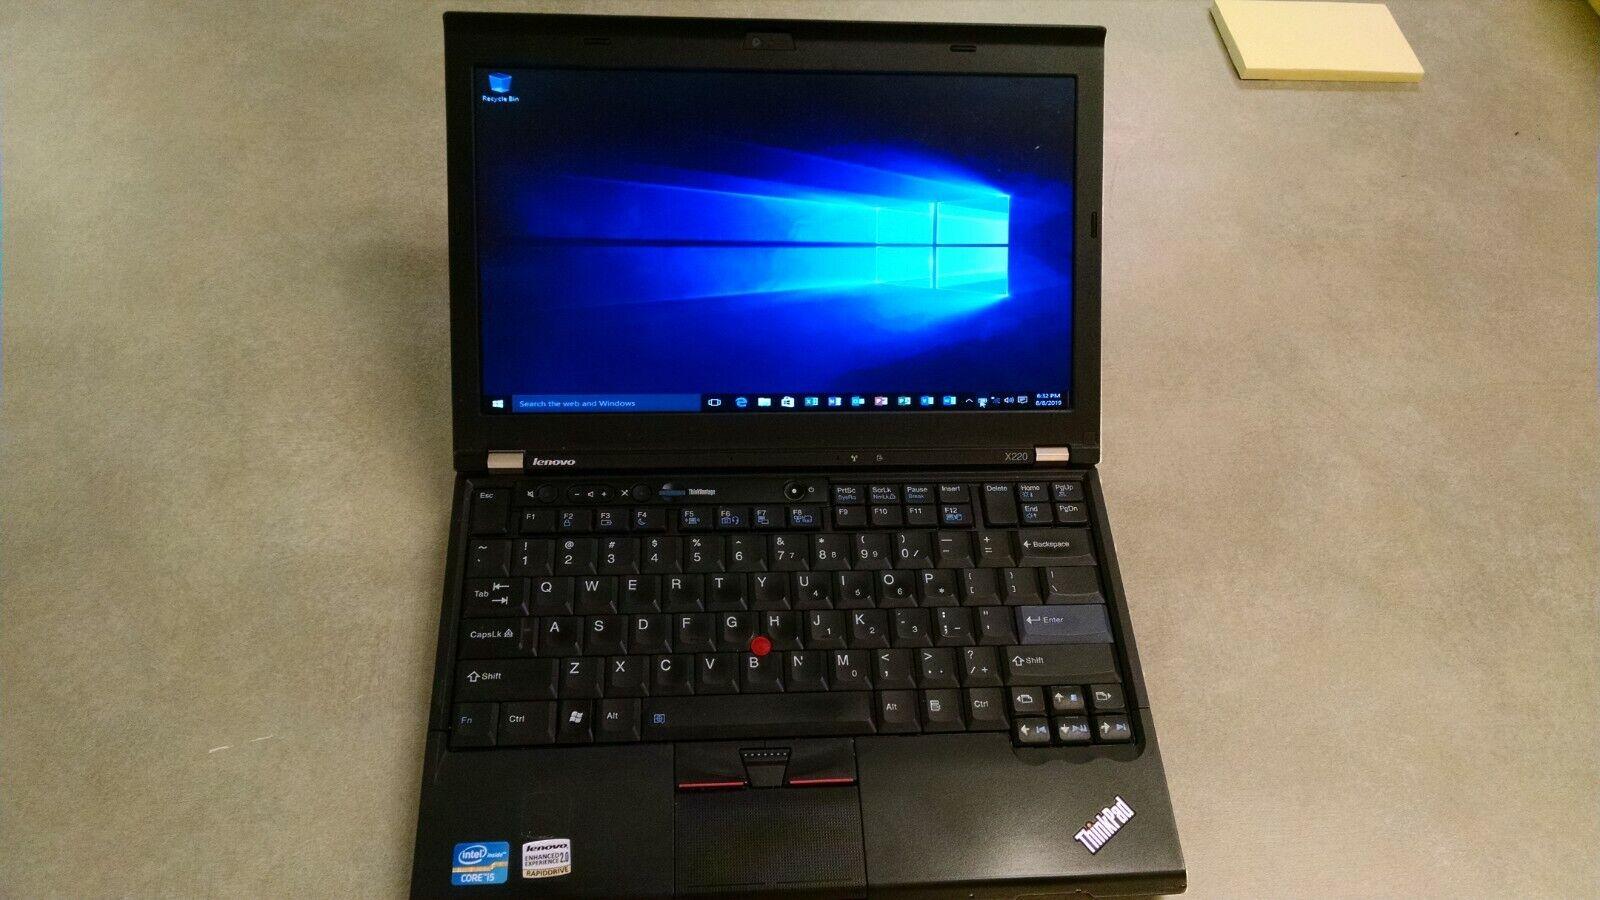 Used Lenovo Thinkpad X220 120GB Hard Drive 8GB RAM Memory Windows 10 Laptop - $179.00